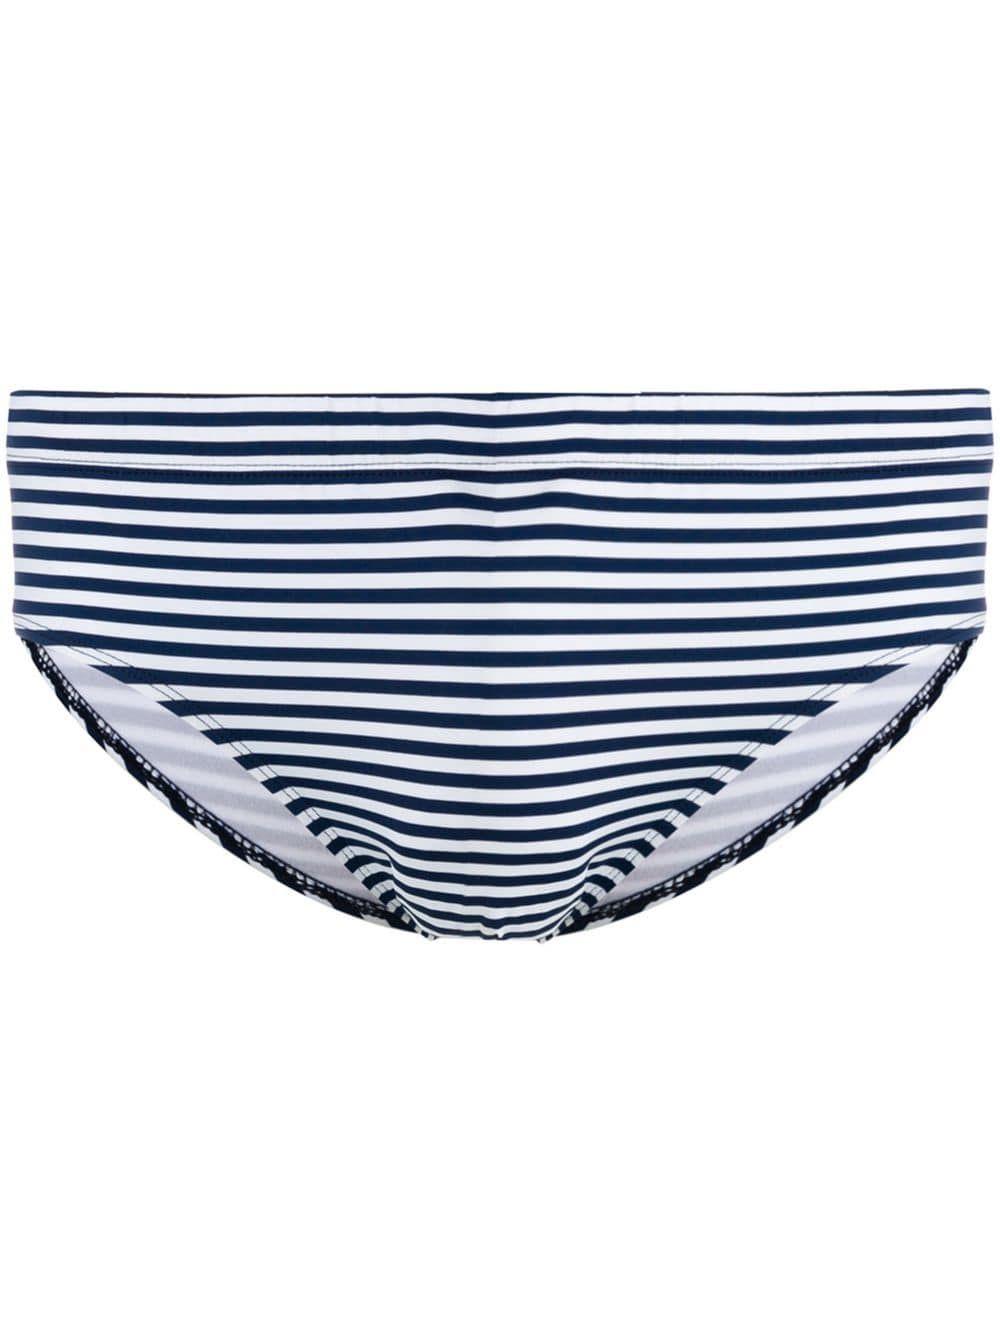 95203a6cff RON DORFF RON DORFF STRIPED SWIMMING TRUNKS - BLUE. #rondorff #cloth ...